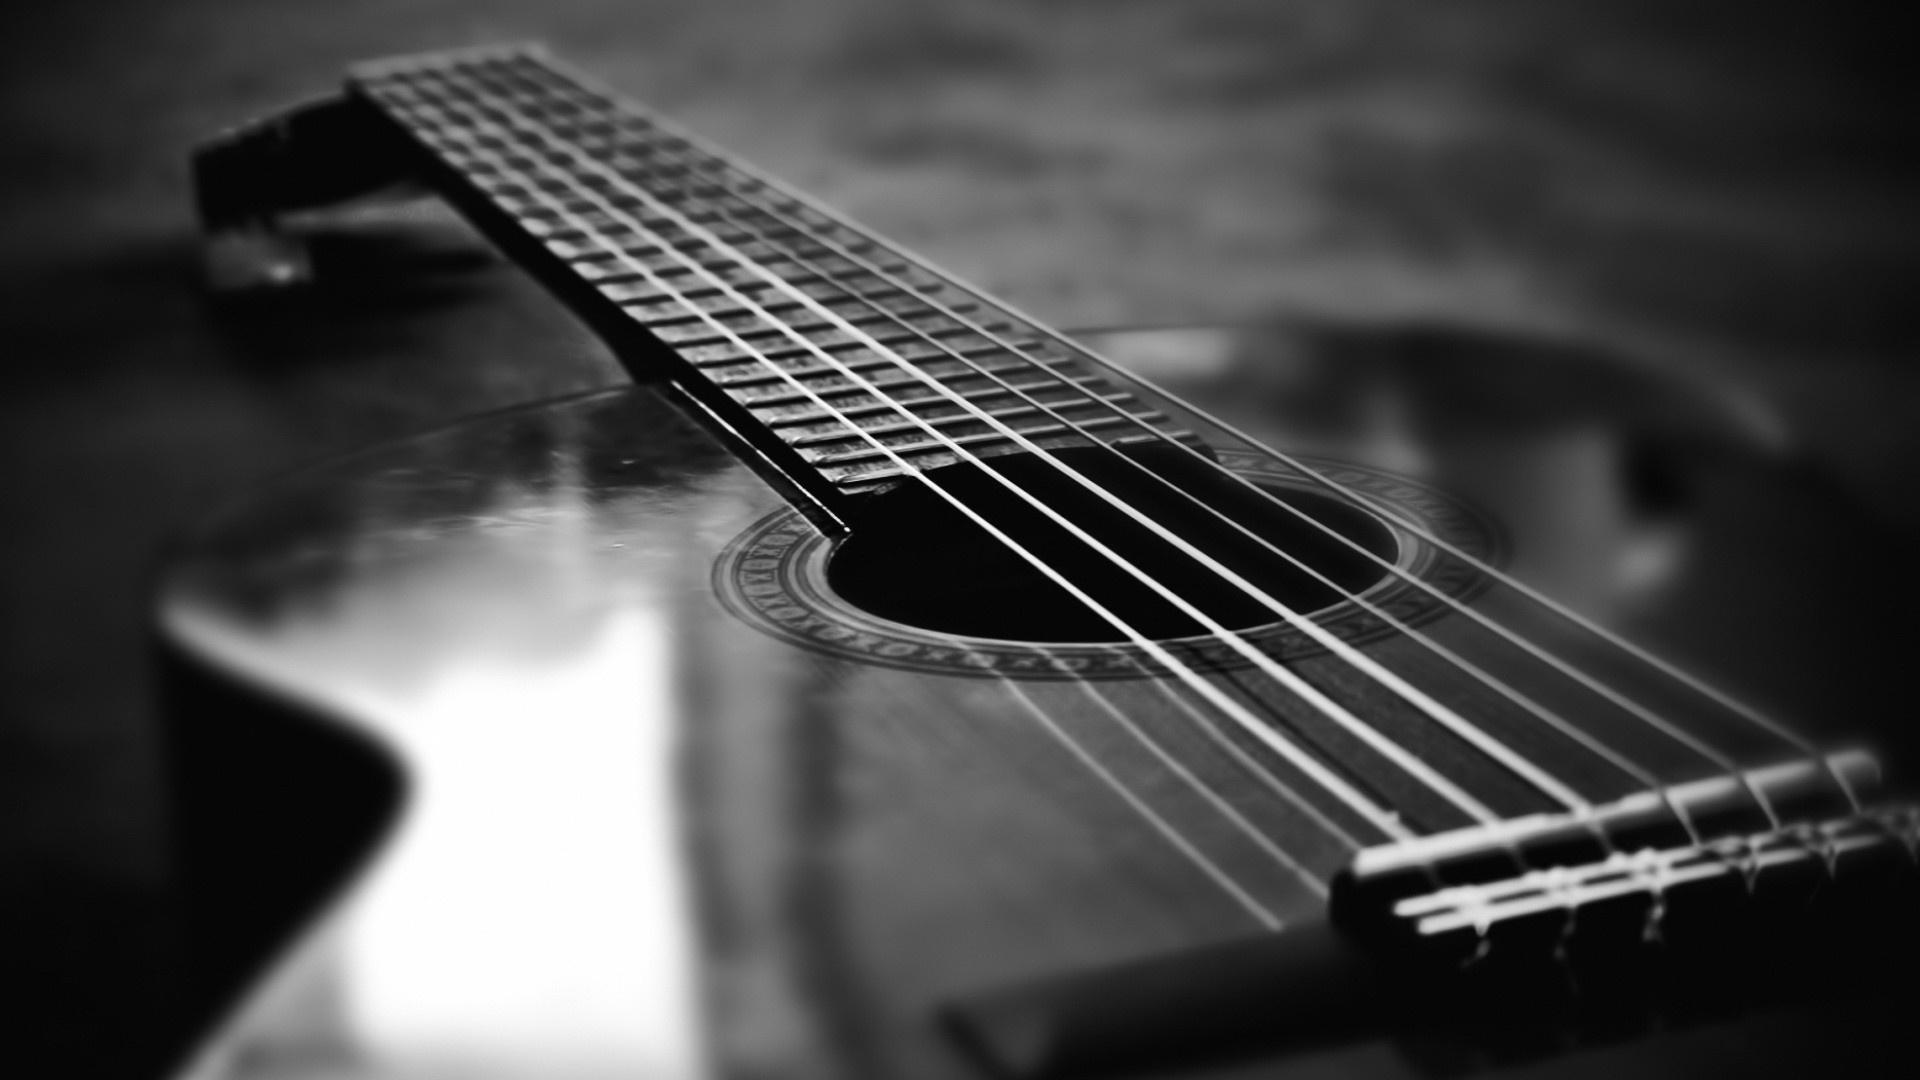 Guitar Wallpapers Most beautiful places in the world 1280×800 Guitar  Wallpaper (57 Wallpapers) | Adorable Wallpapers | Desktop | Pinterest |  Guitars, …